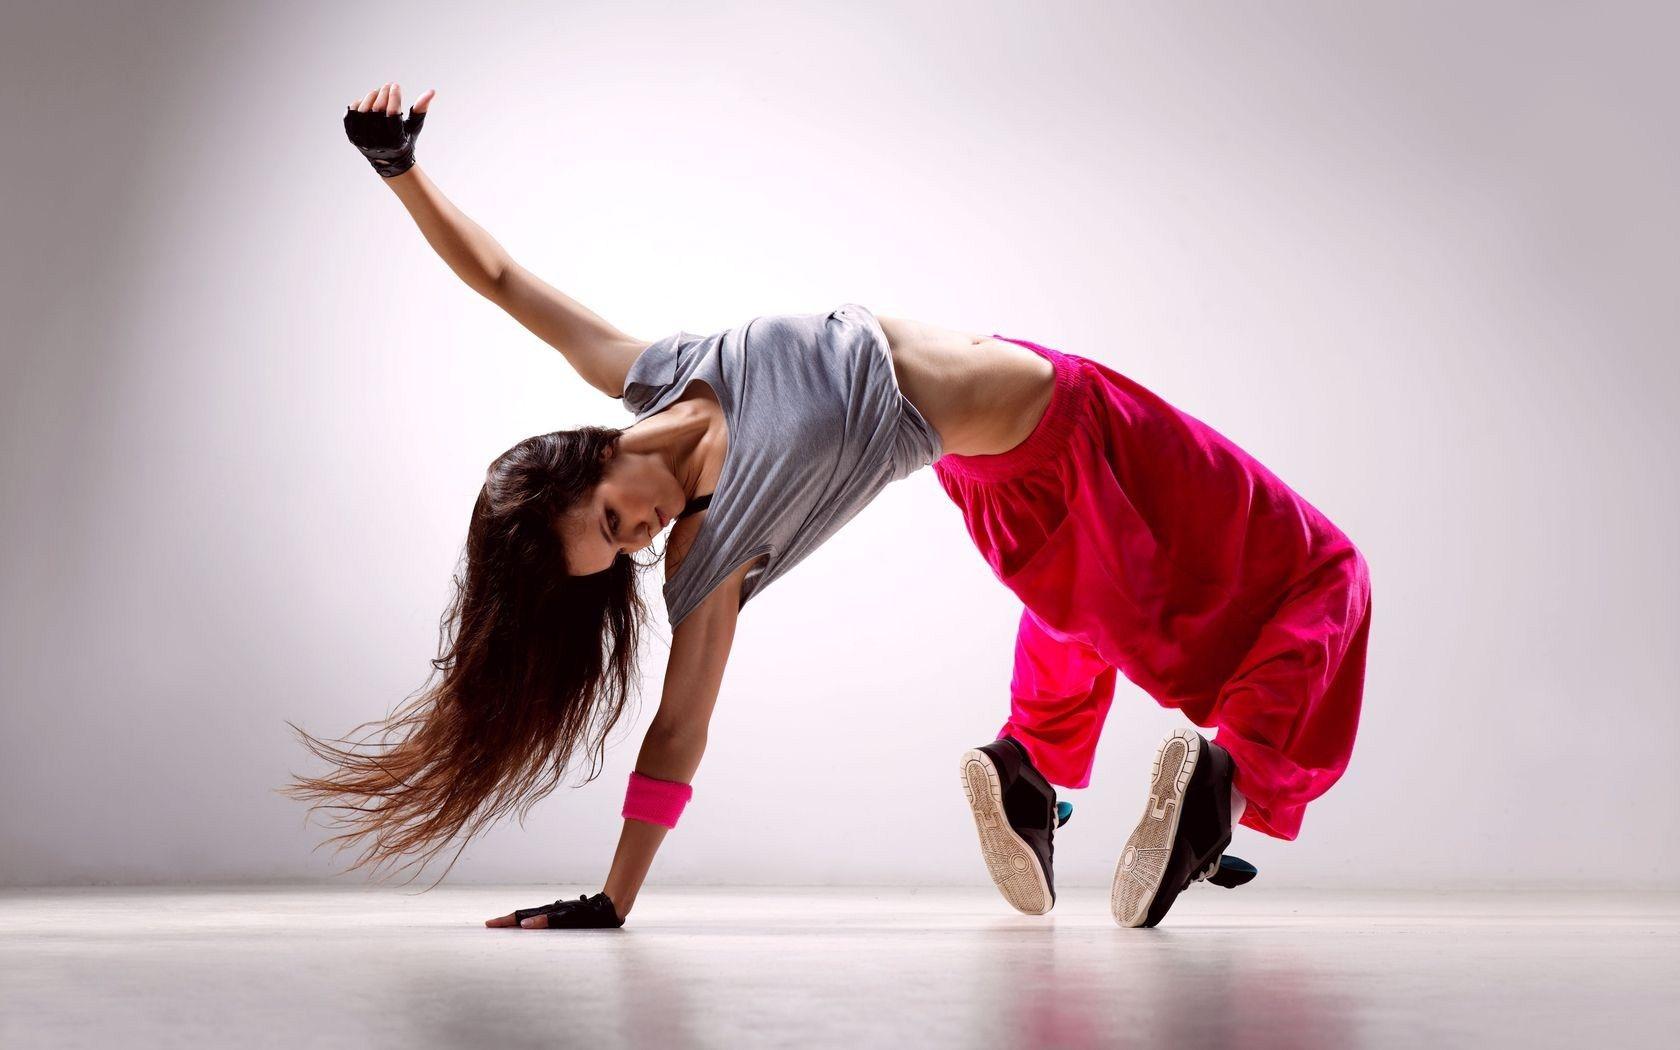 Dance Changed My Life Hip Hop Dancer Dance Photography Dance Poses